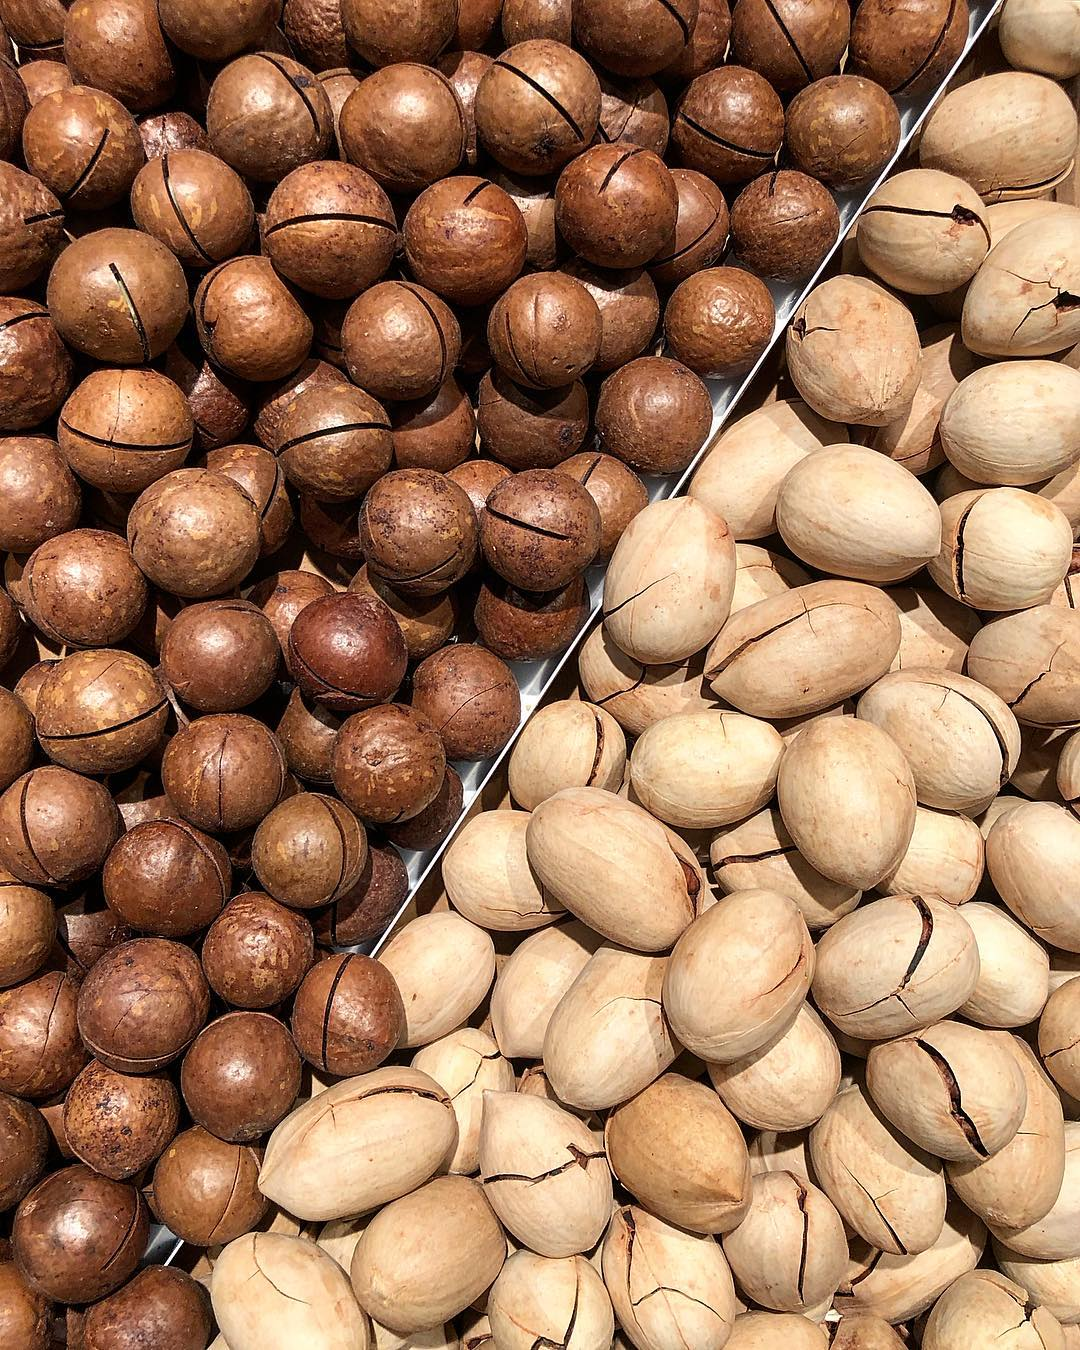 Разновидности ореха в картинках